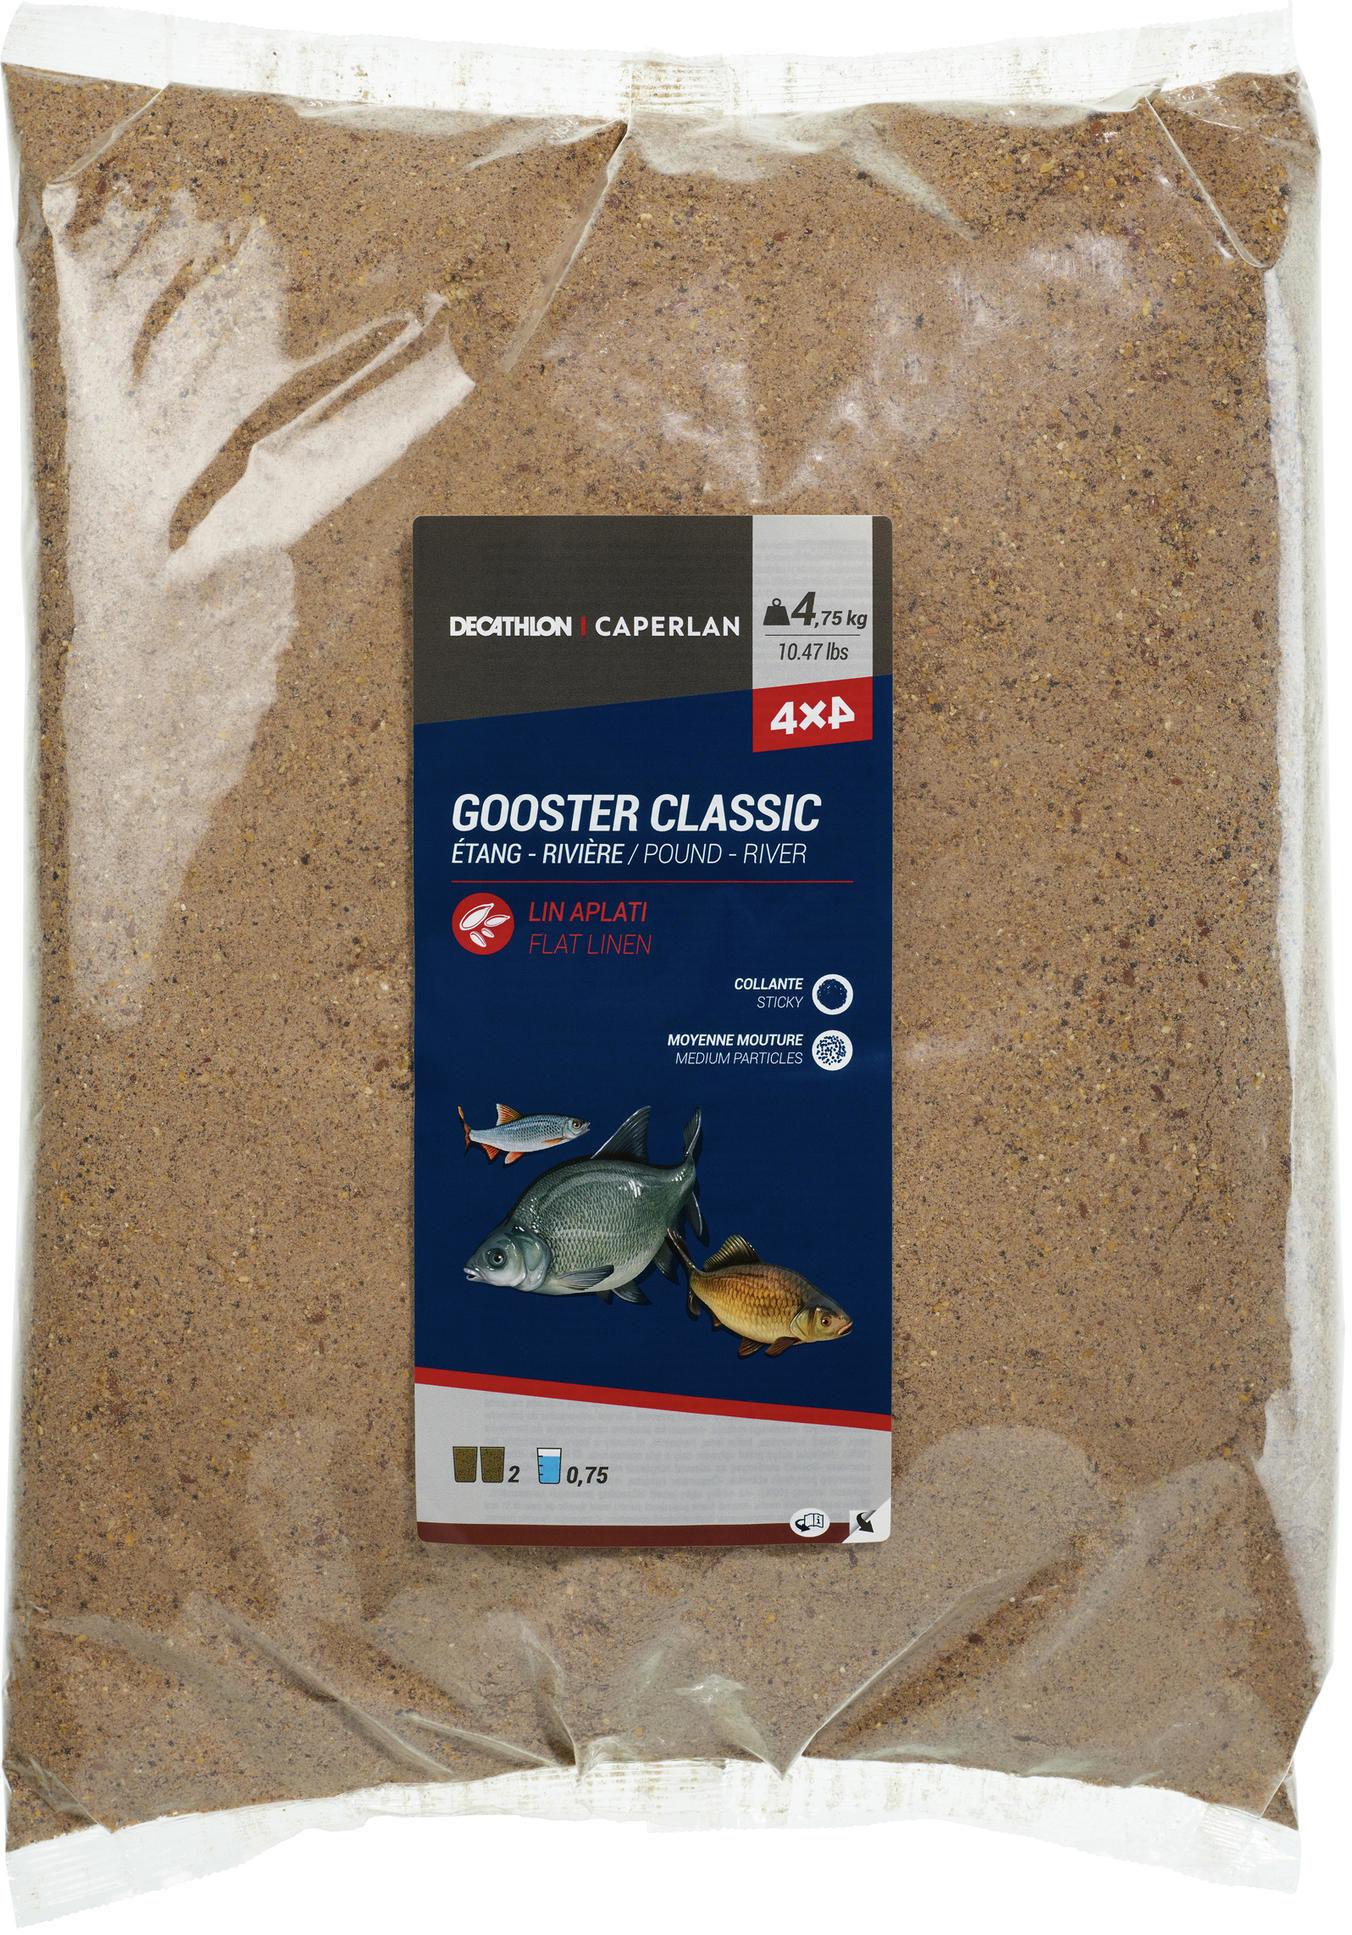 Zanęta Gooster Classic 4x4 4,75 kg